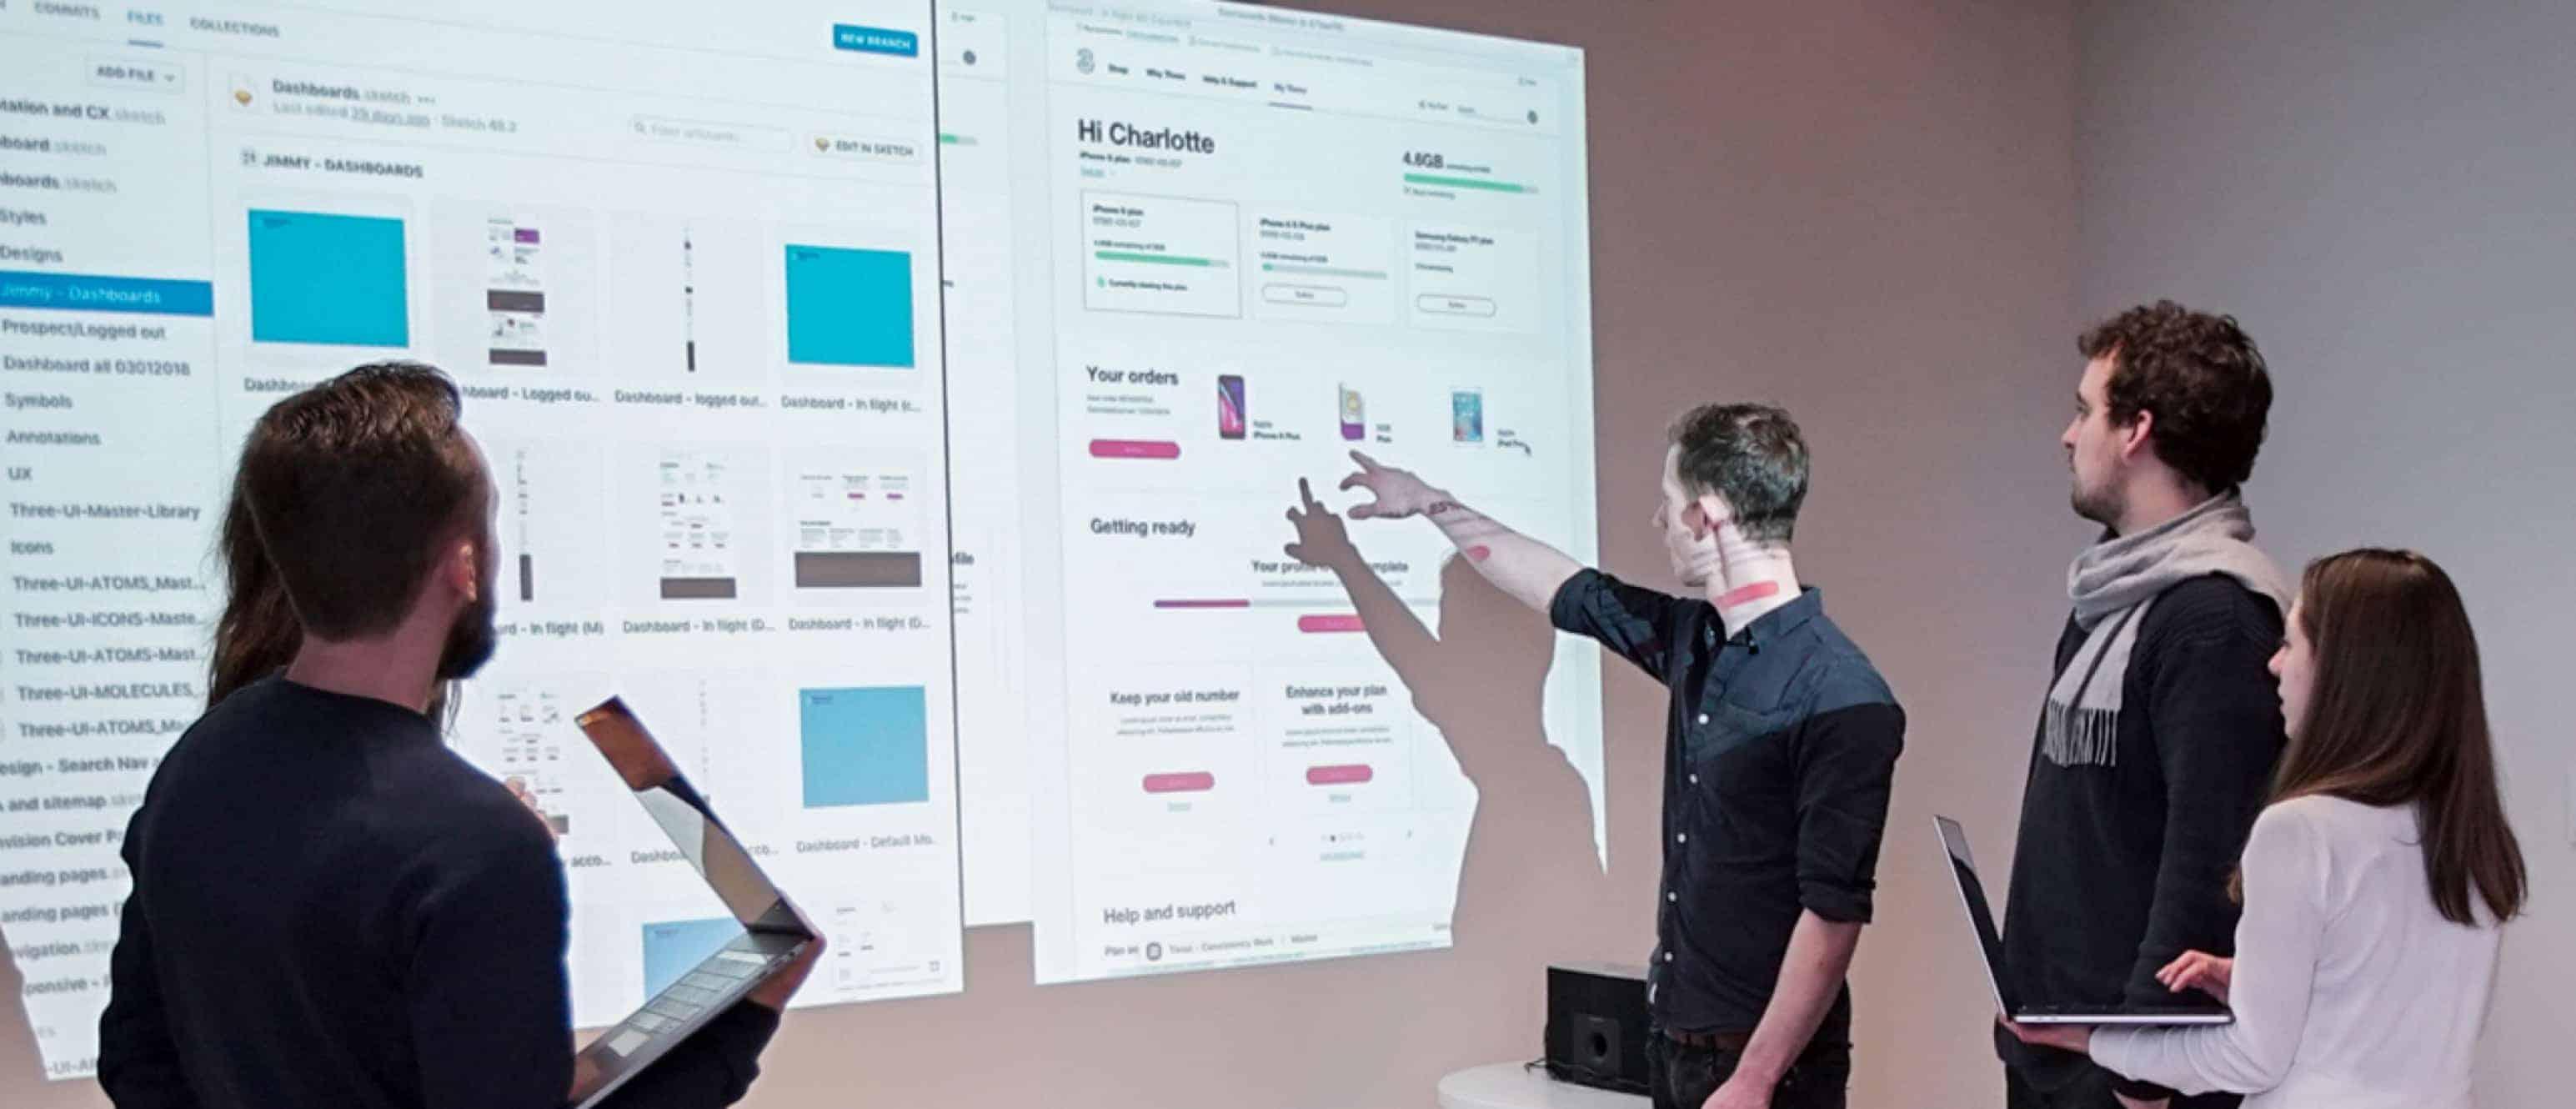 The BIO Agency design team collaboration